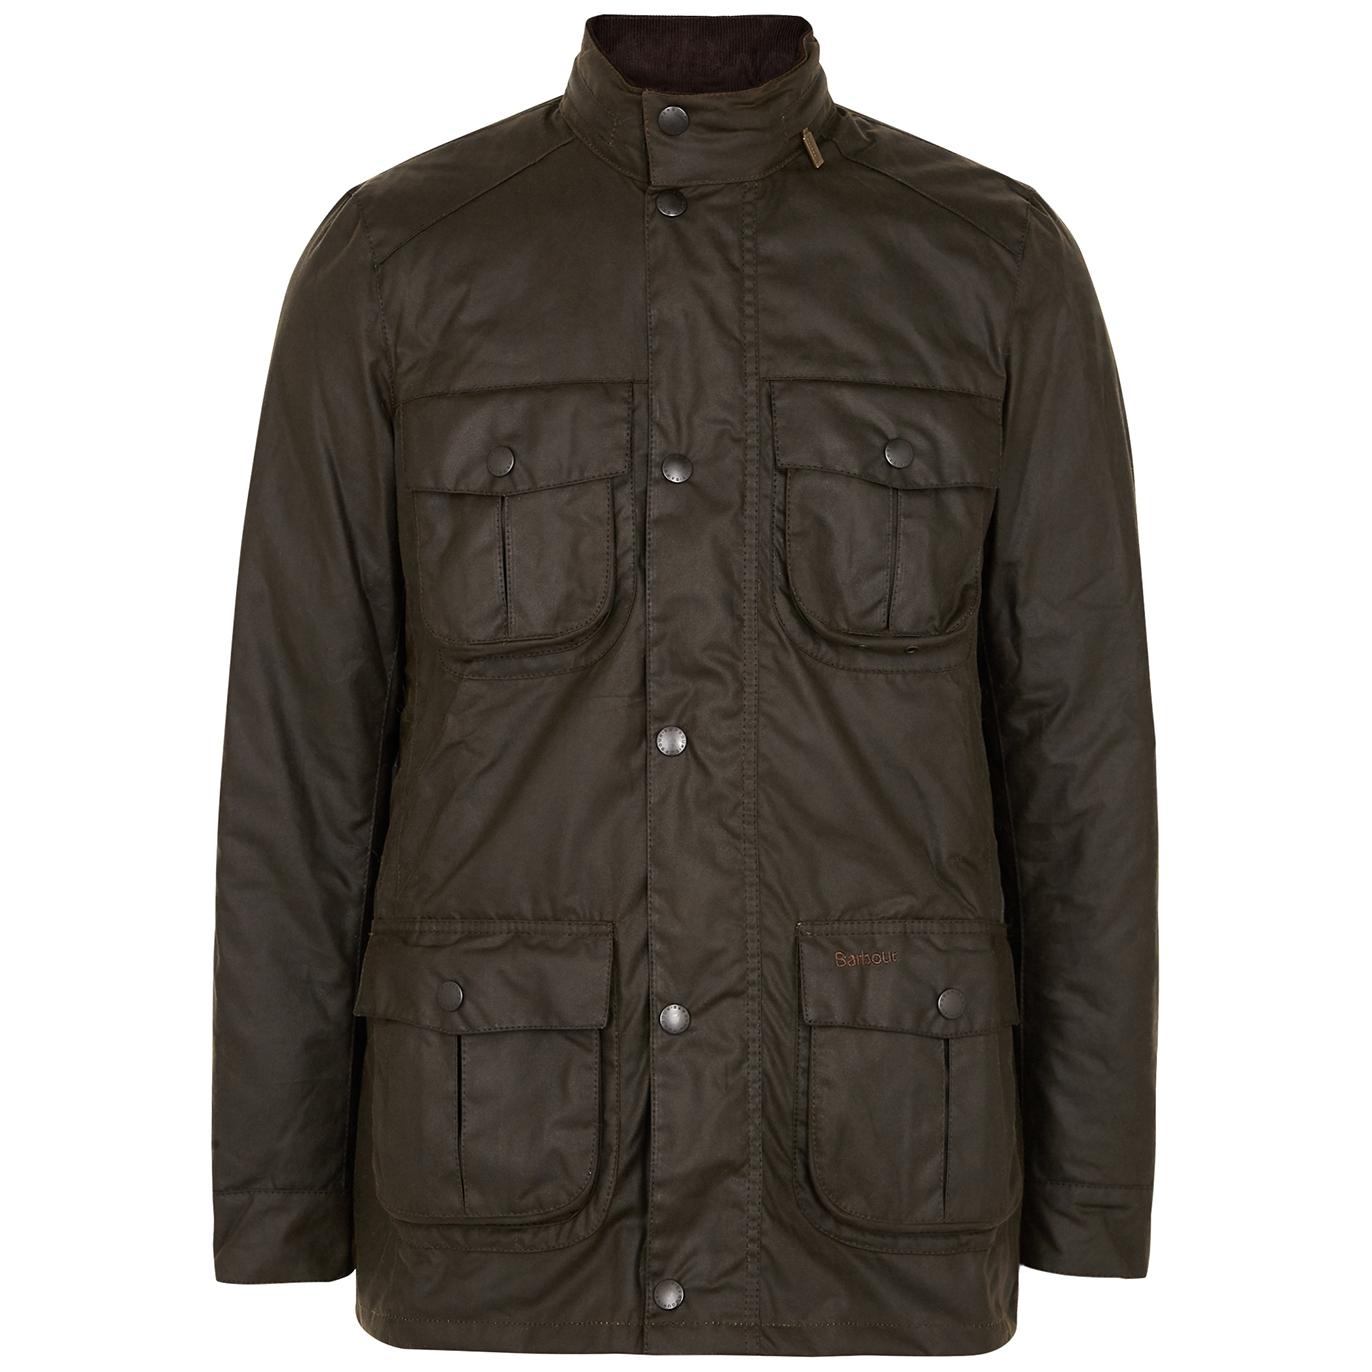 Corbridge dark olive waxed cotton jacket